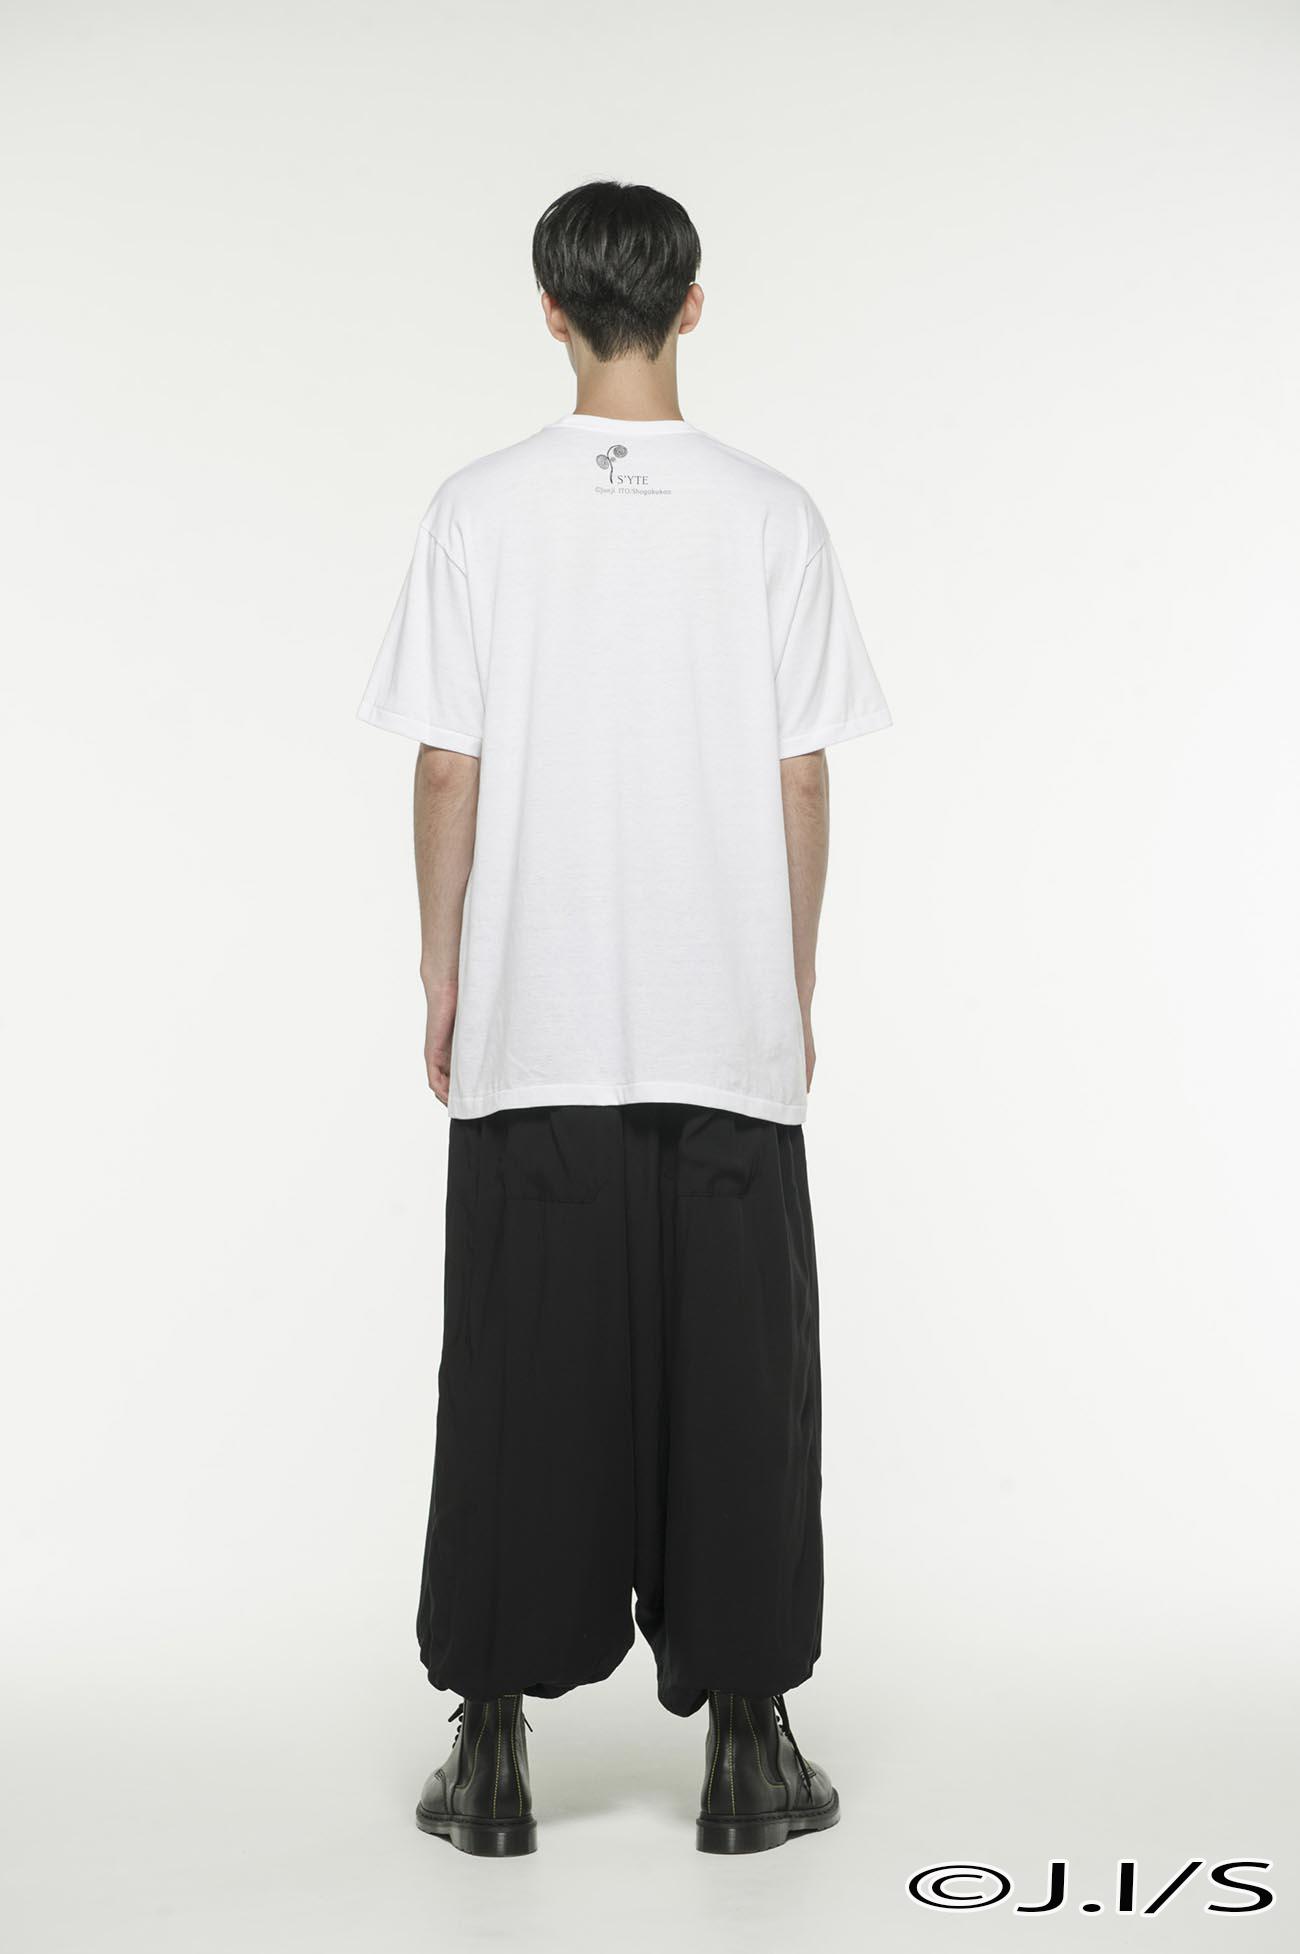 黑谷蓟 × Yohji Yamamoto T恤